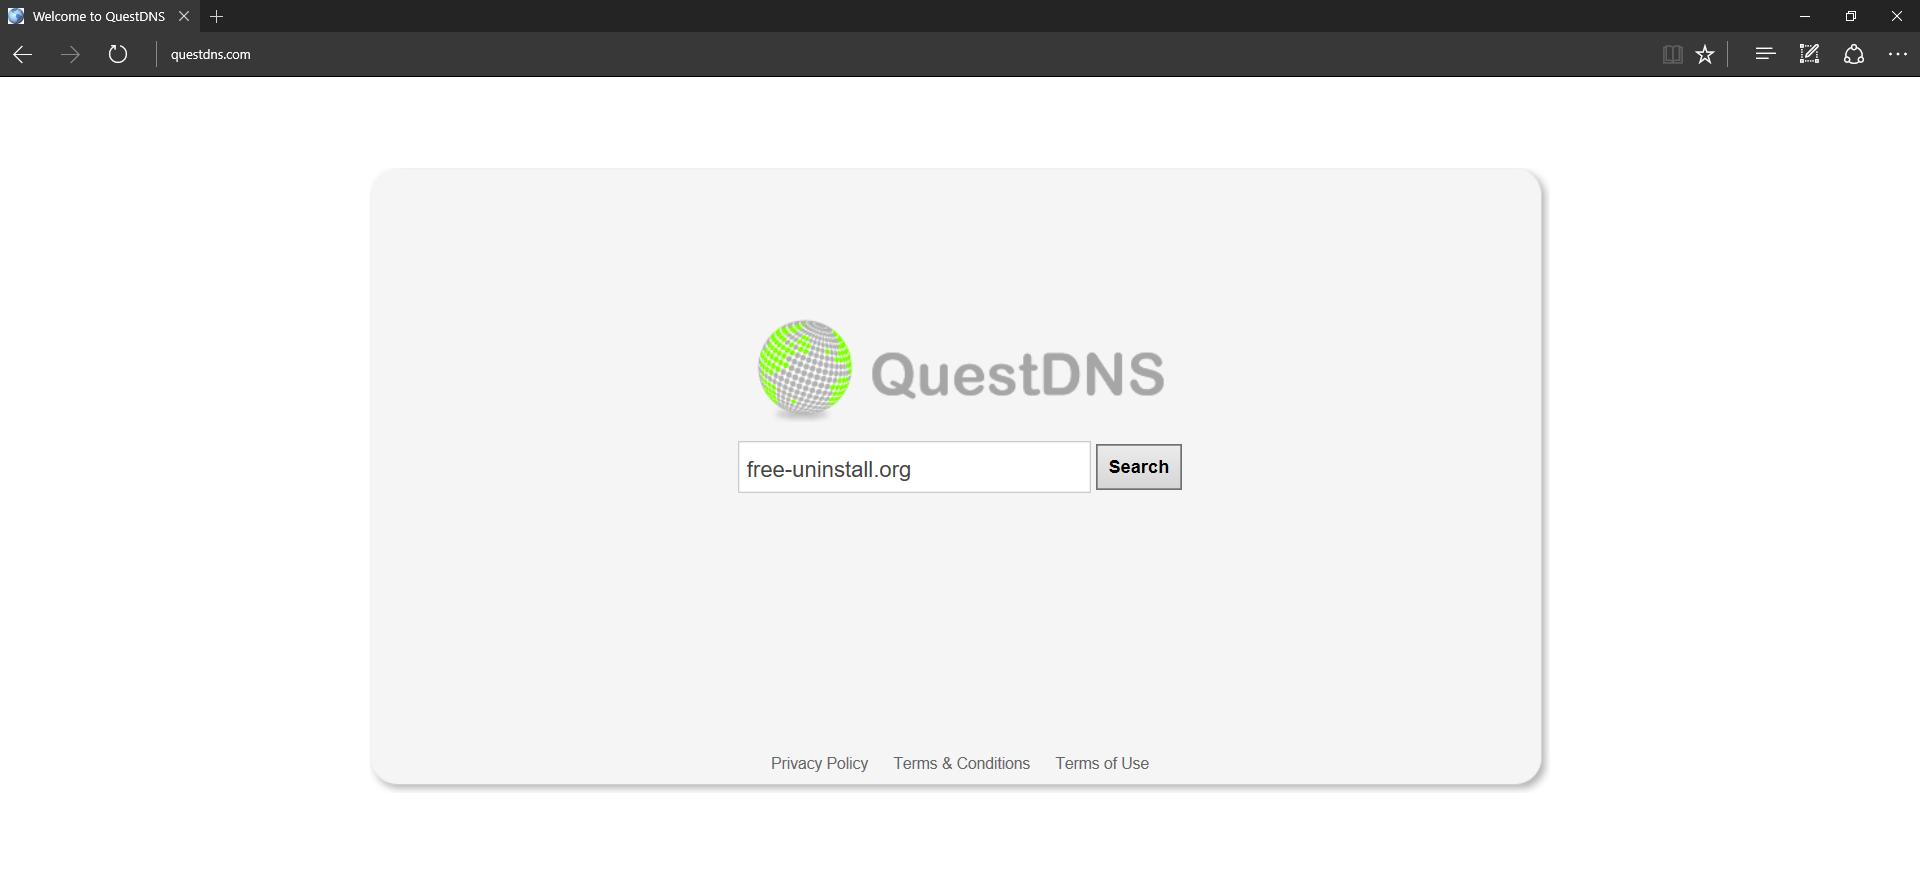 QuestDNS.com Hijacker